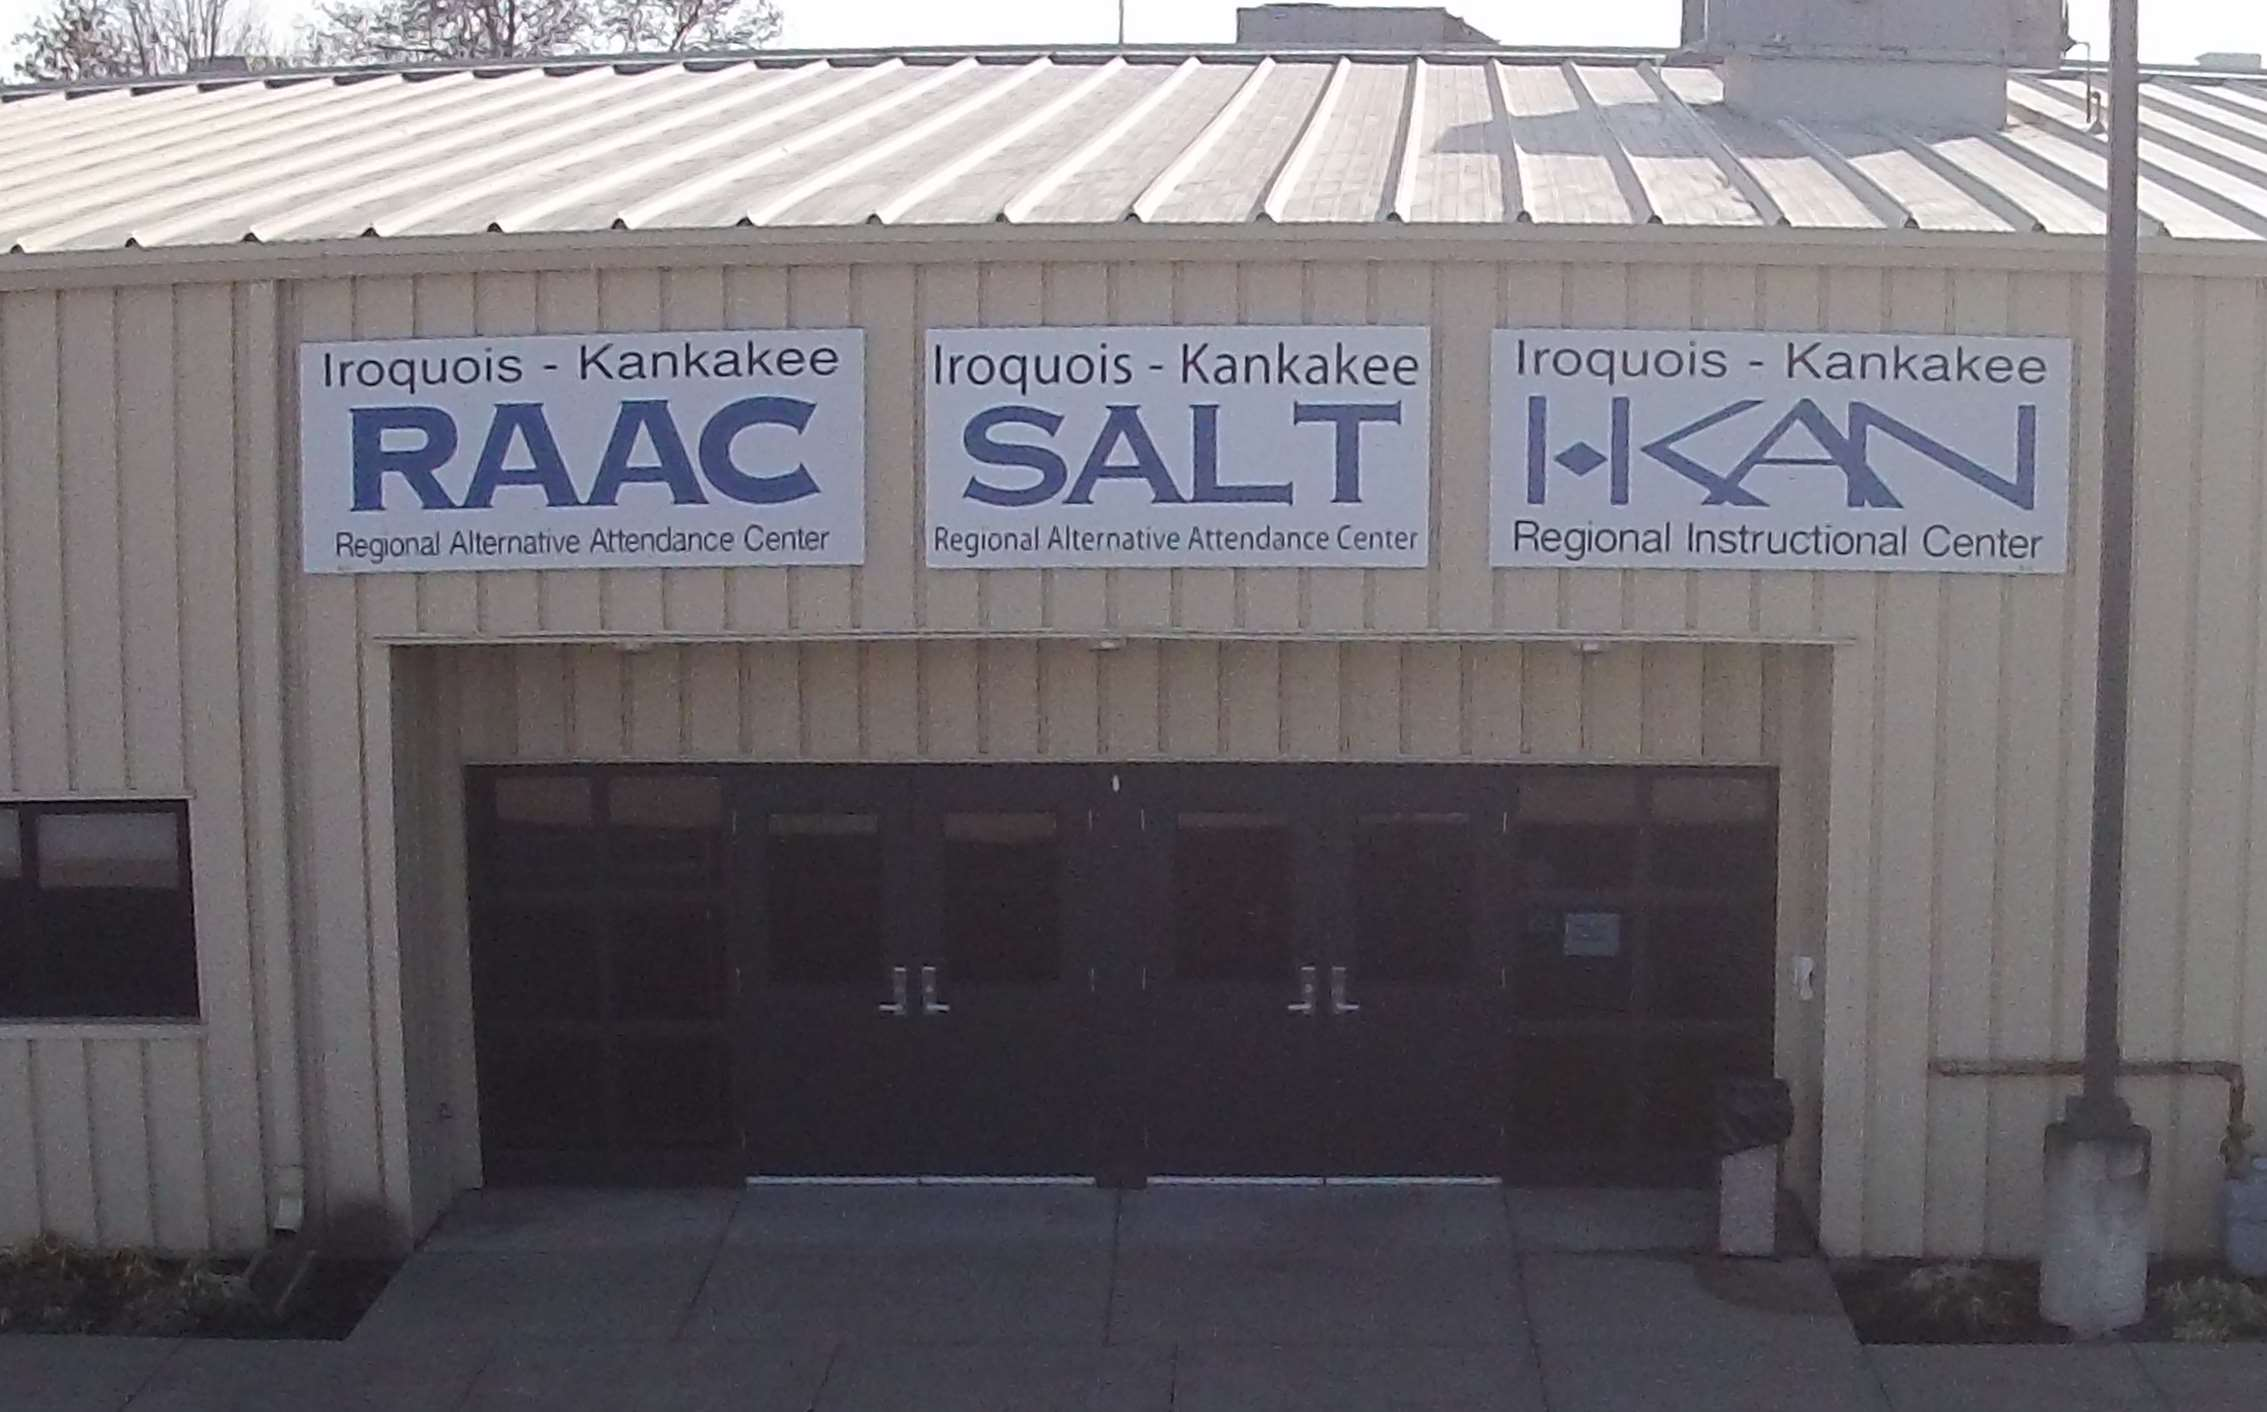 I-KAN Schools: RAAC & SALT Building